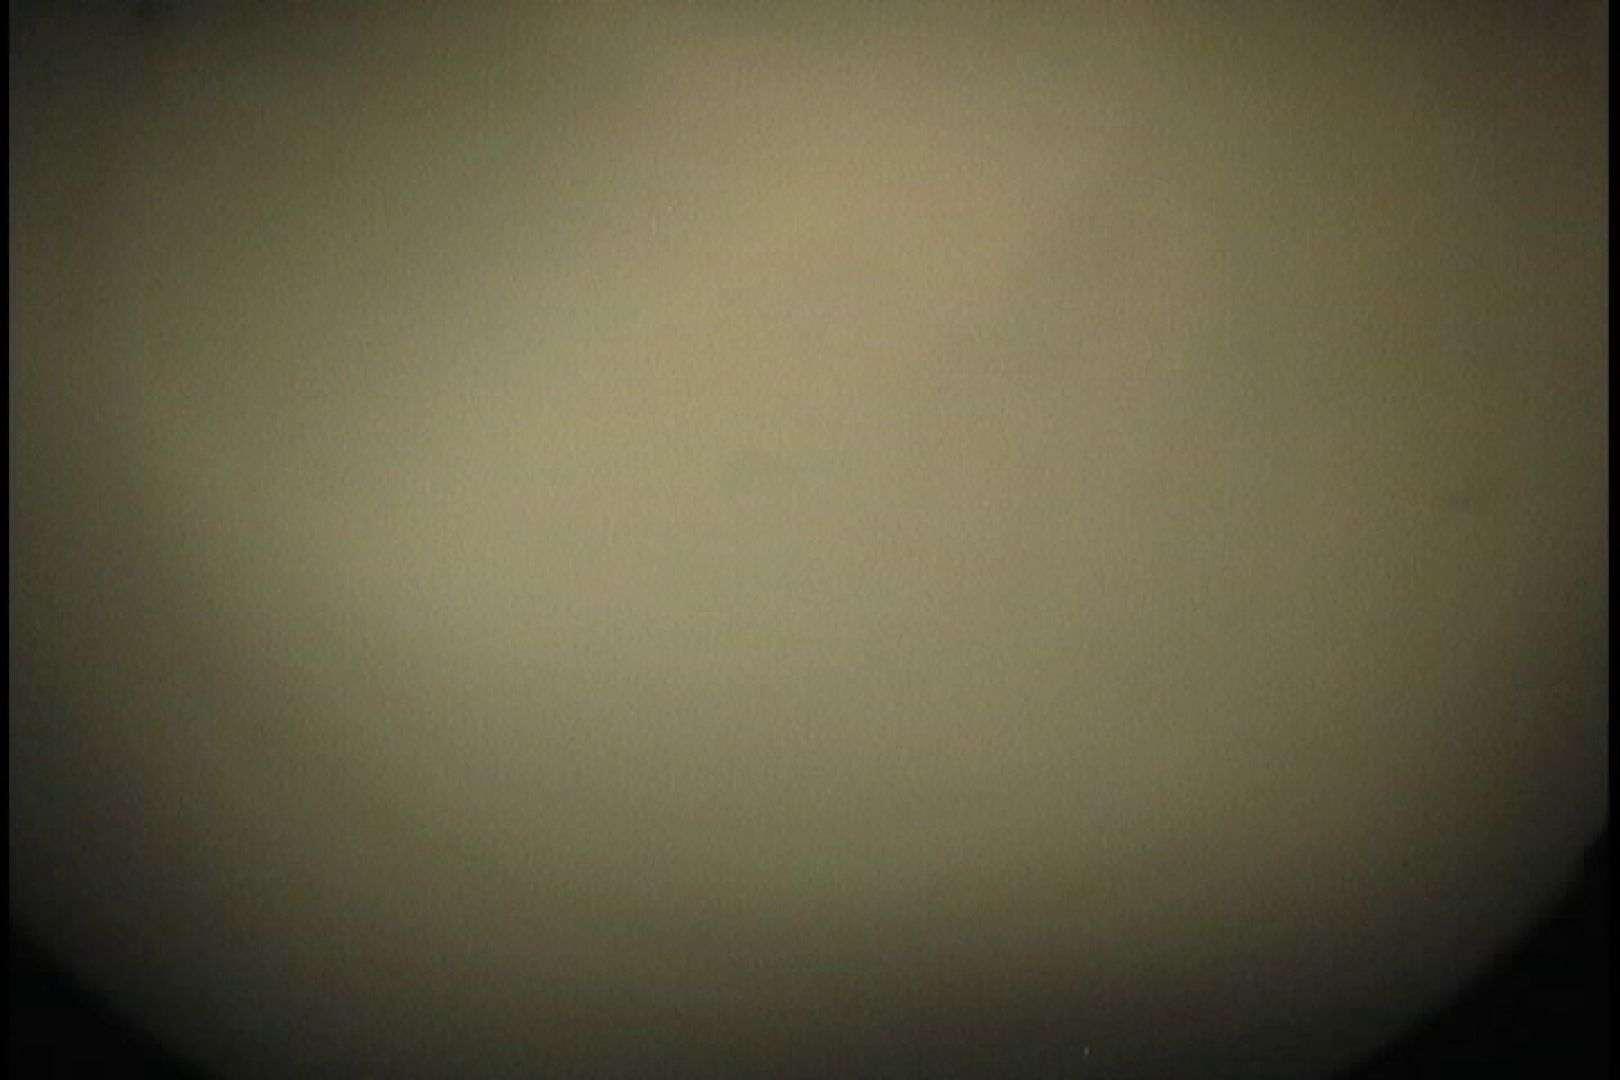 No.32 脇とVラインの処理が甘い貧乳ギャル、タンポンの紐がぶらぶら ギャル攻め ワレメ無修正動画無料 111画像 23